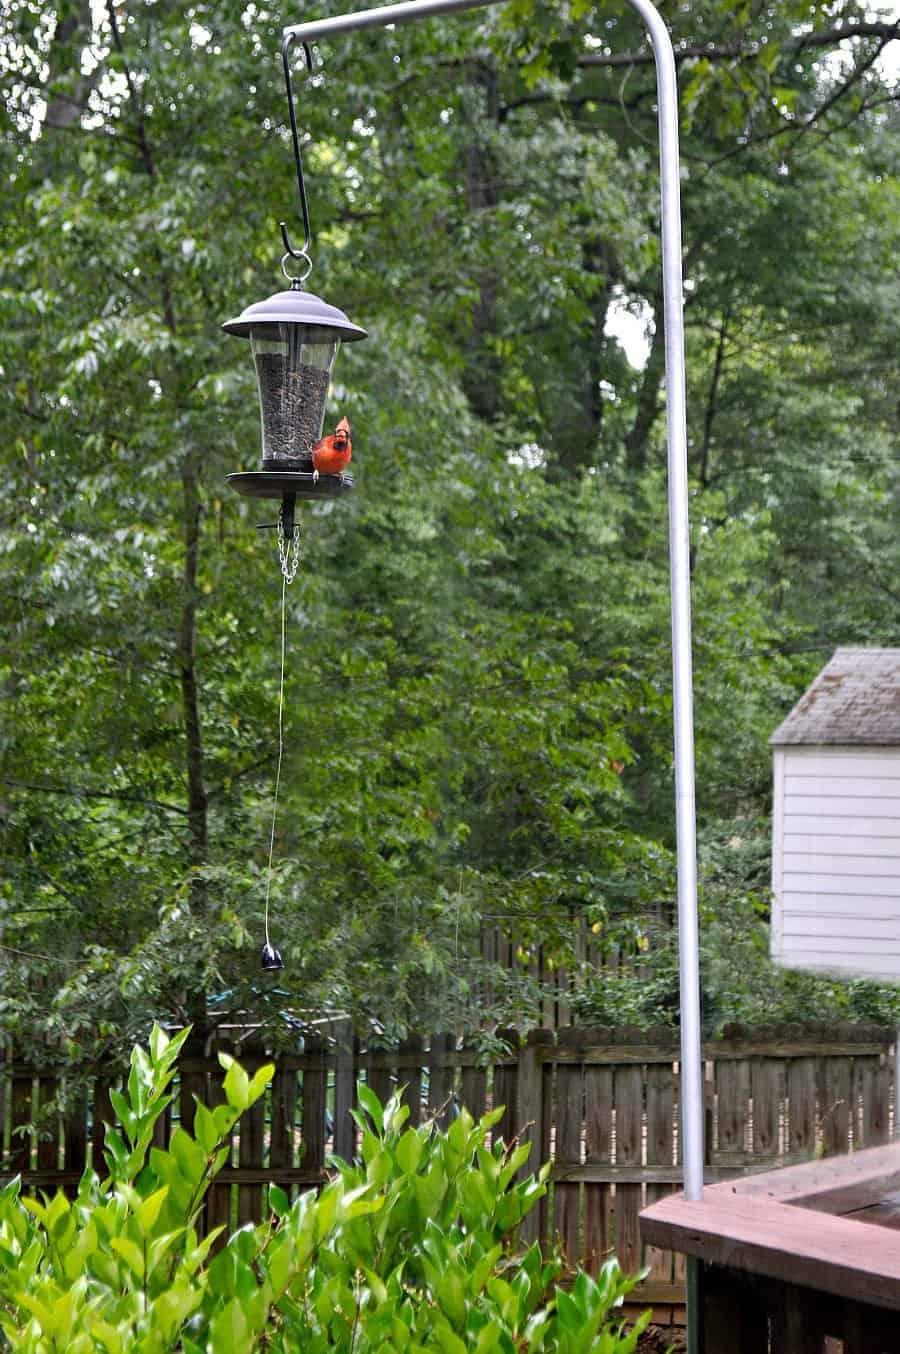 cardinal sitting on bird feeder